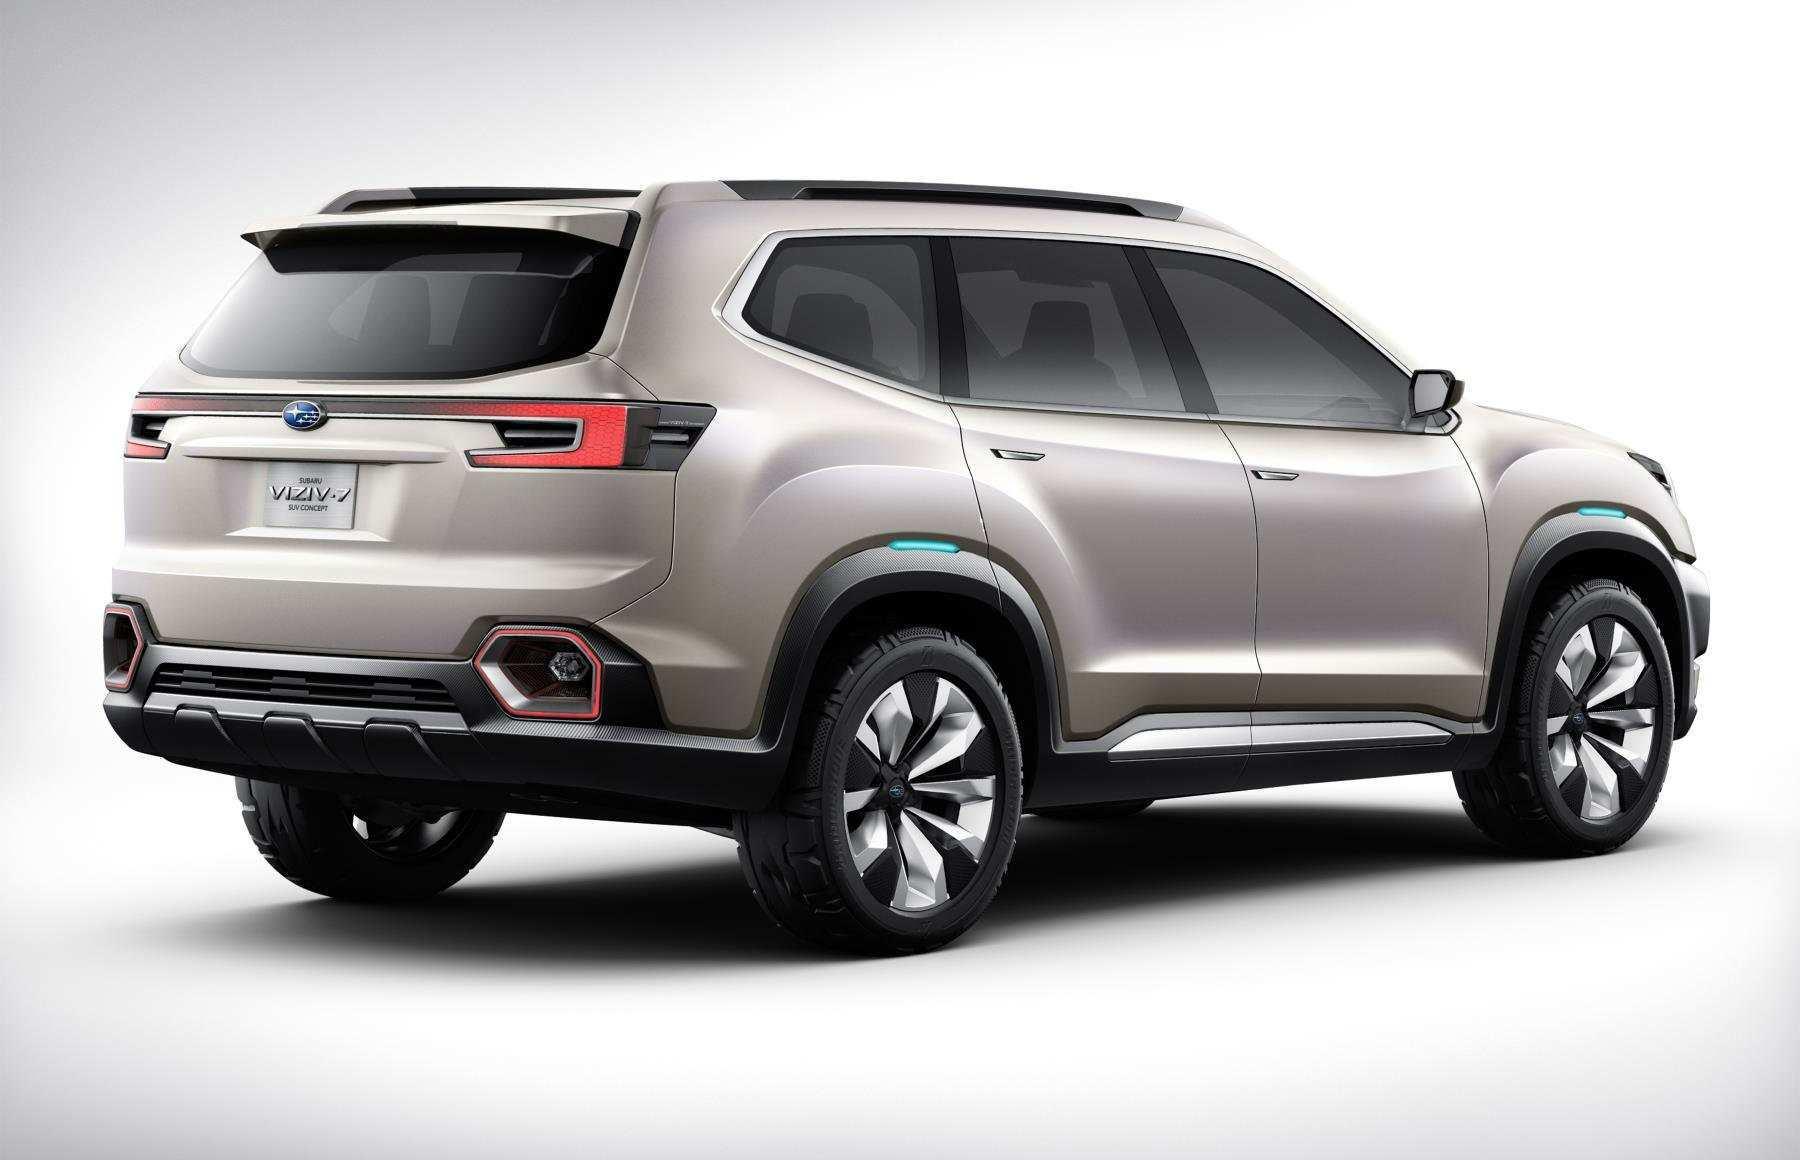 25 Great Subaru Tribeca Concept Price with Subaru Tribeca Concept